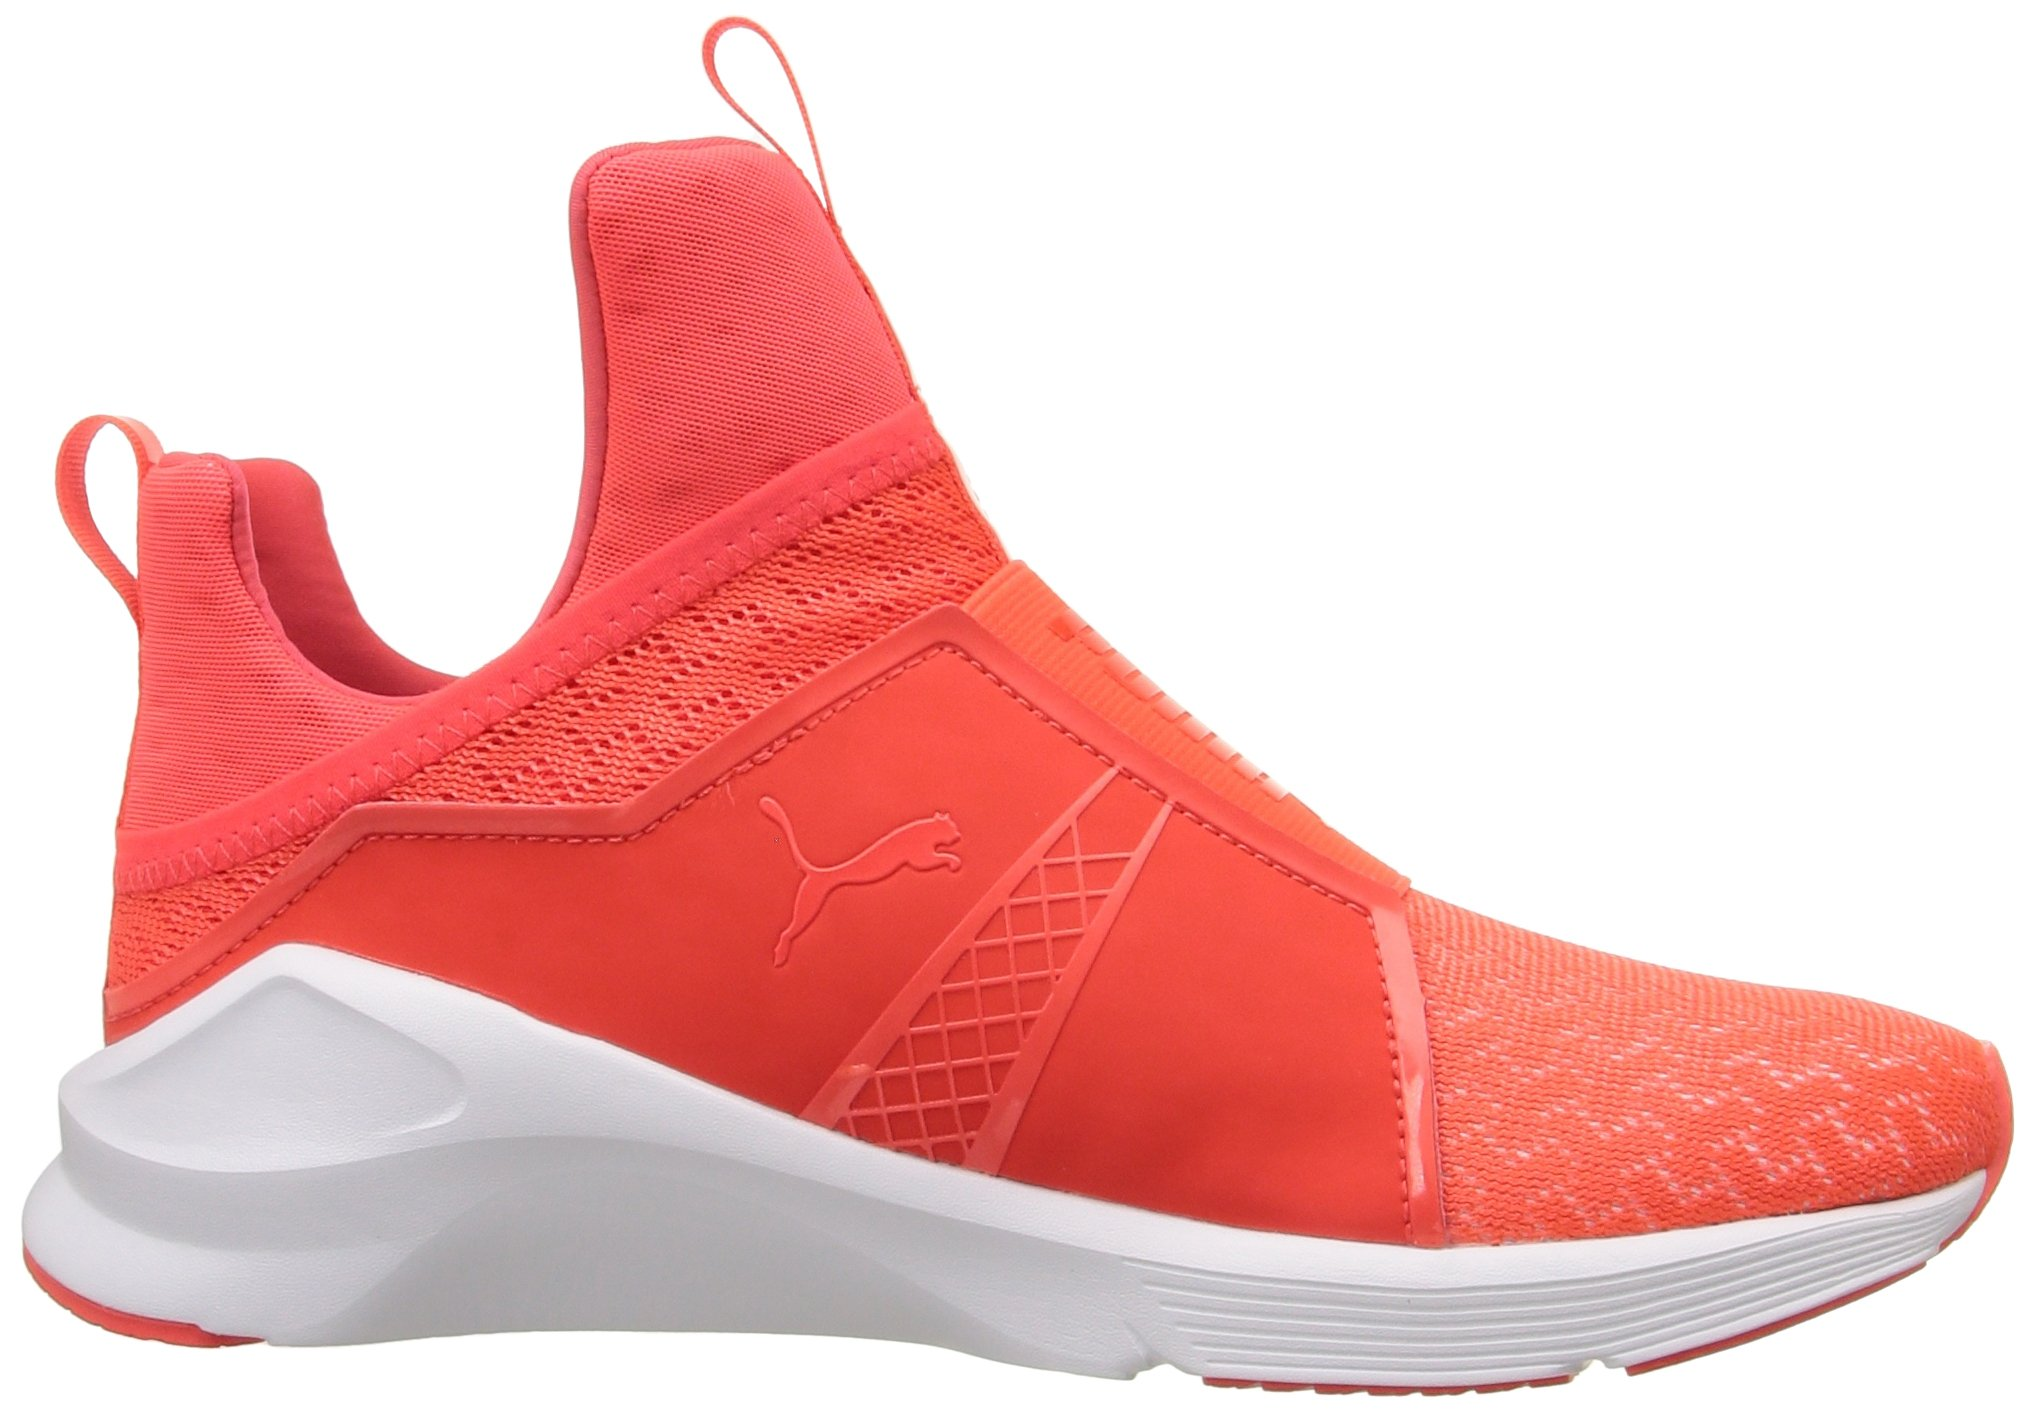 PUMA Women's Fierce Eng Mesh Cross-Trainer Shoe, Red Blast White, 5.5 M US by PUMA (Image #7)